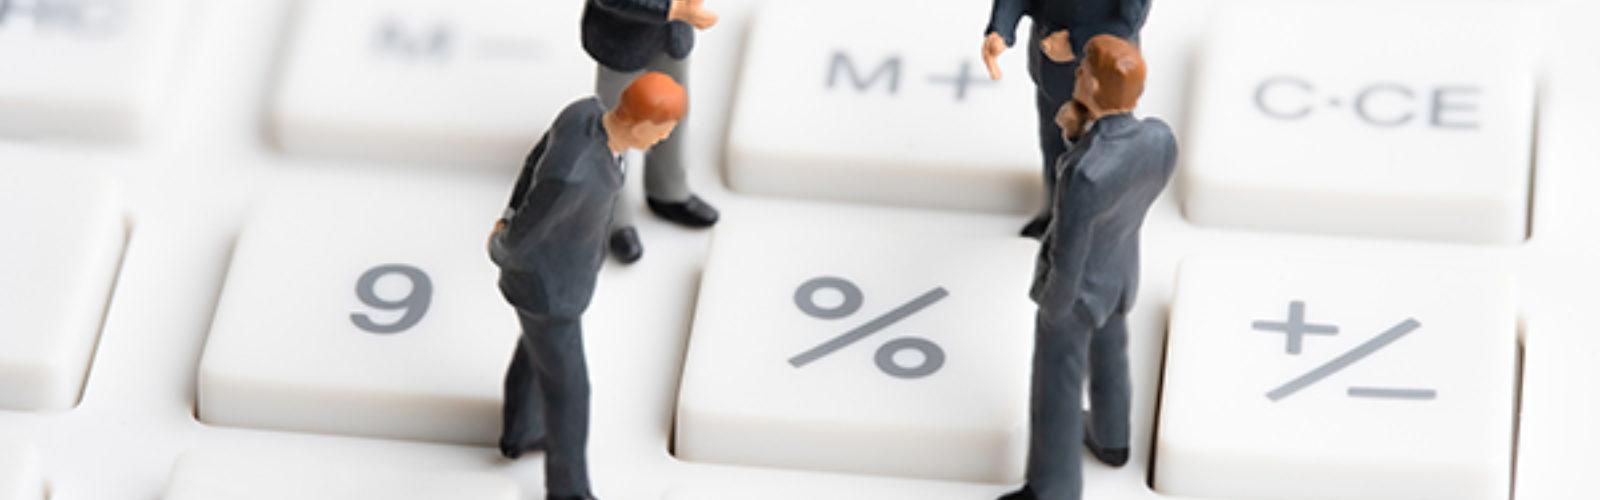 Business-Mans-Standing-On-Calc (bs313149565)_.jpg